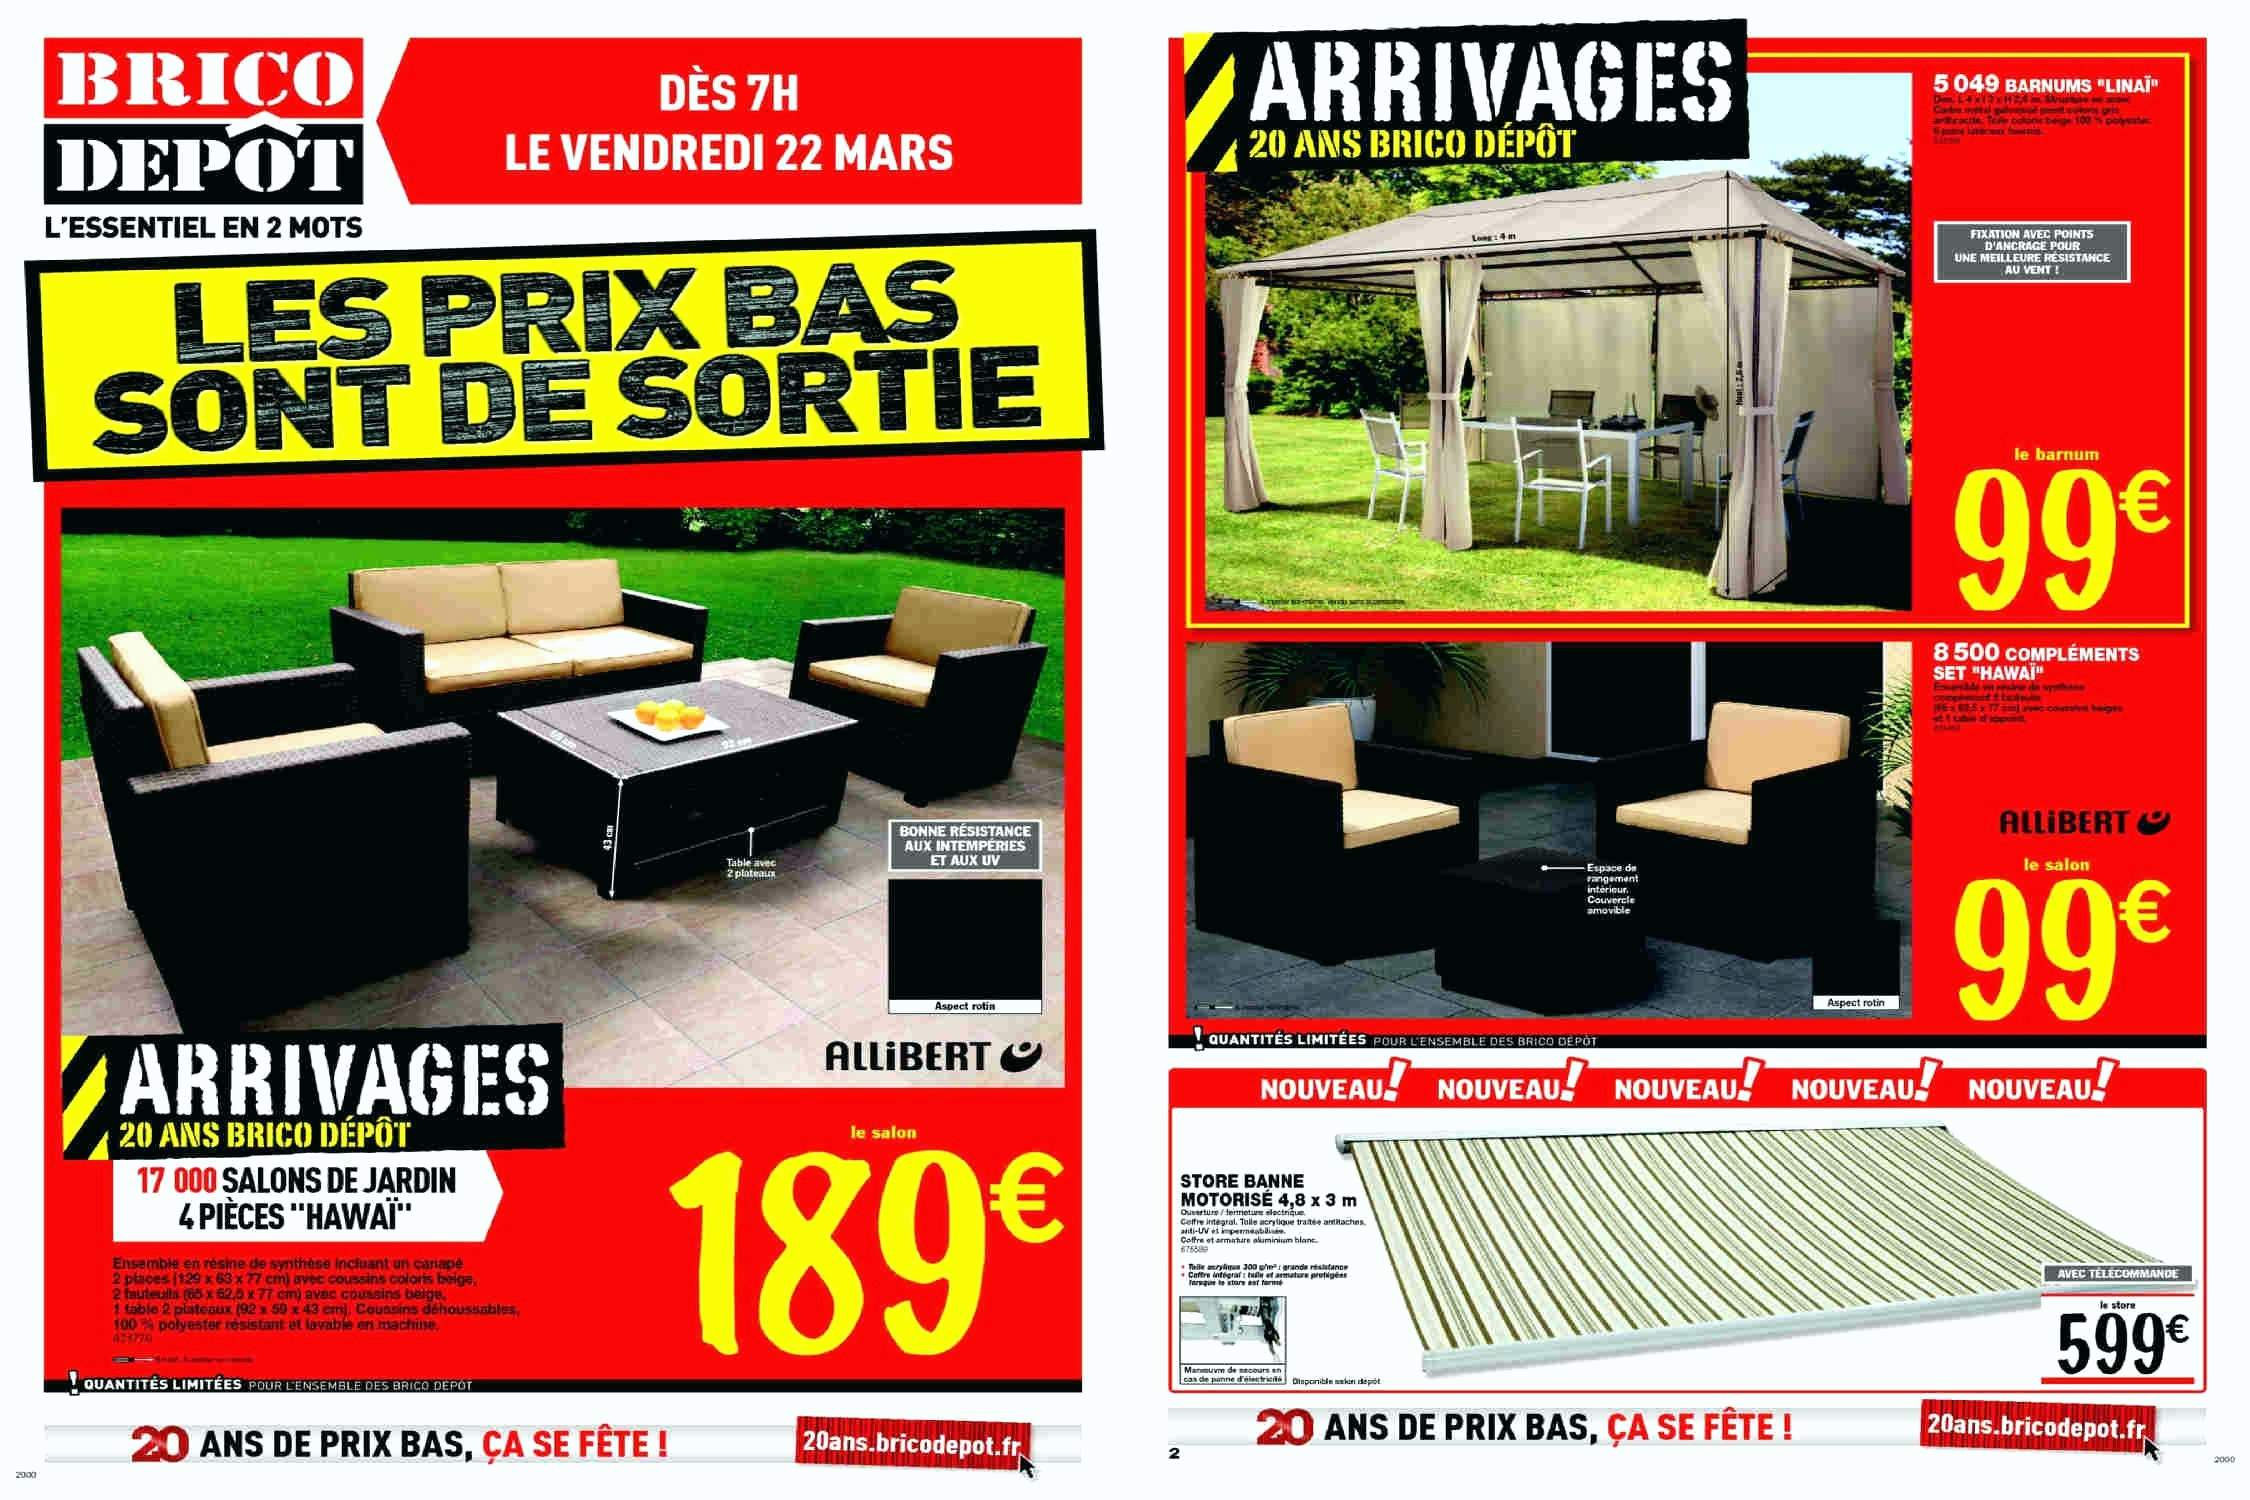 Achat Table De Jardin Best Of Jardin Brico Abris Depot ... intérieur Salon De Jardin Allibert Brico Depot